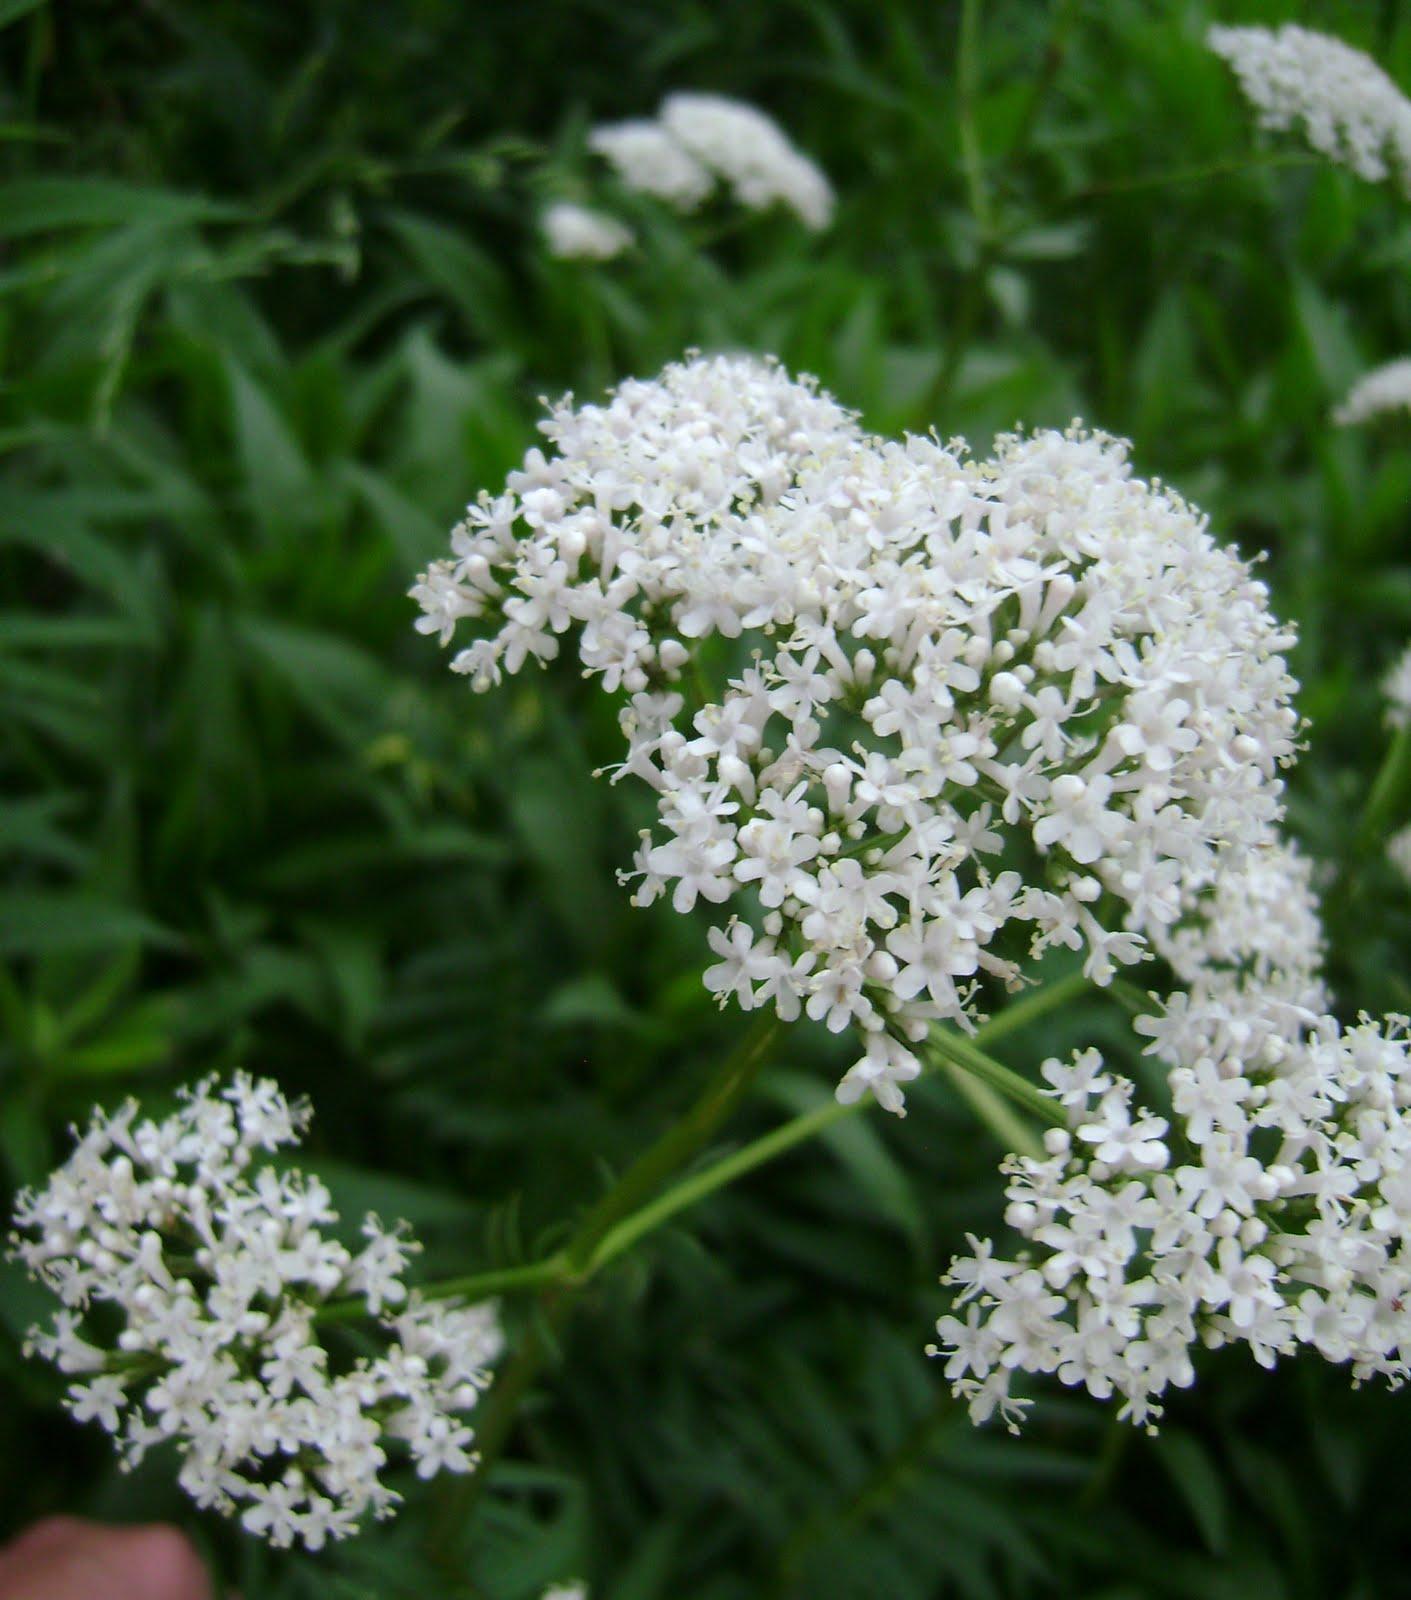 Native Flowers Of Illinois - Flower